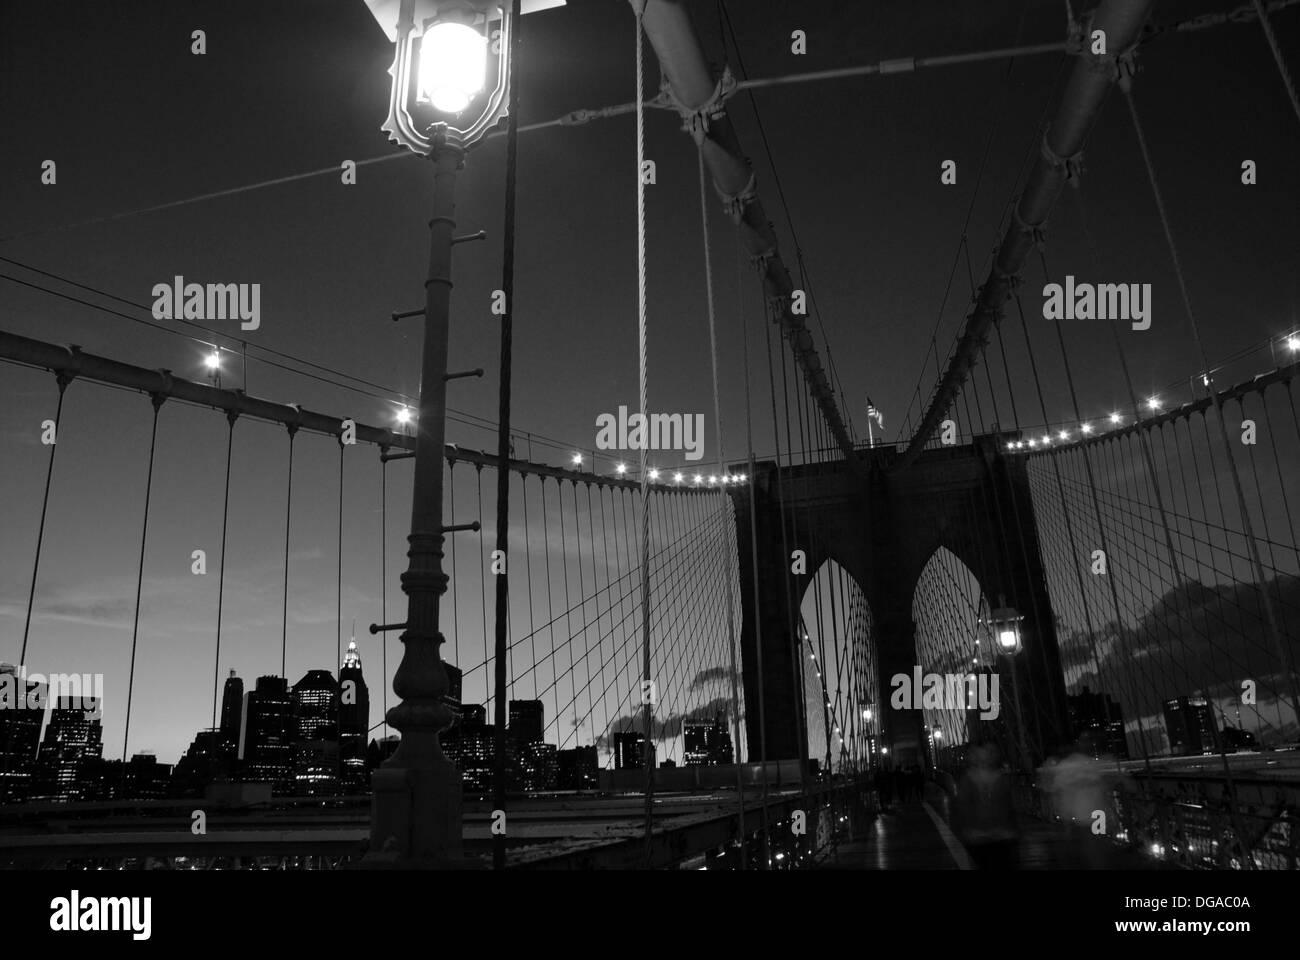 Brooklyn Bridge in the Evening - Stock Image